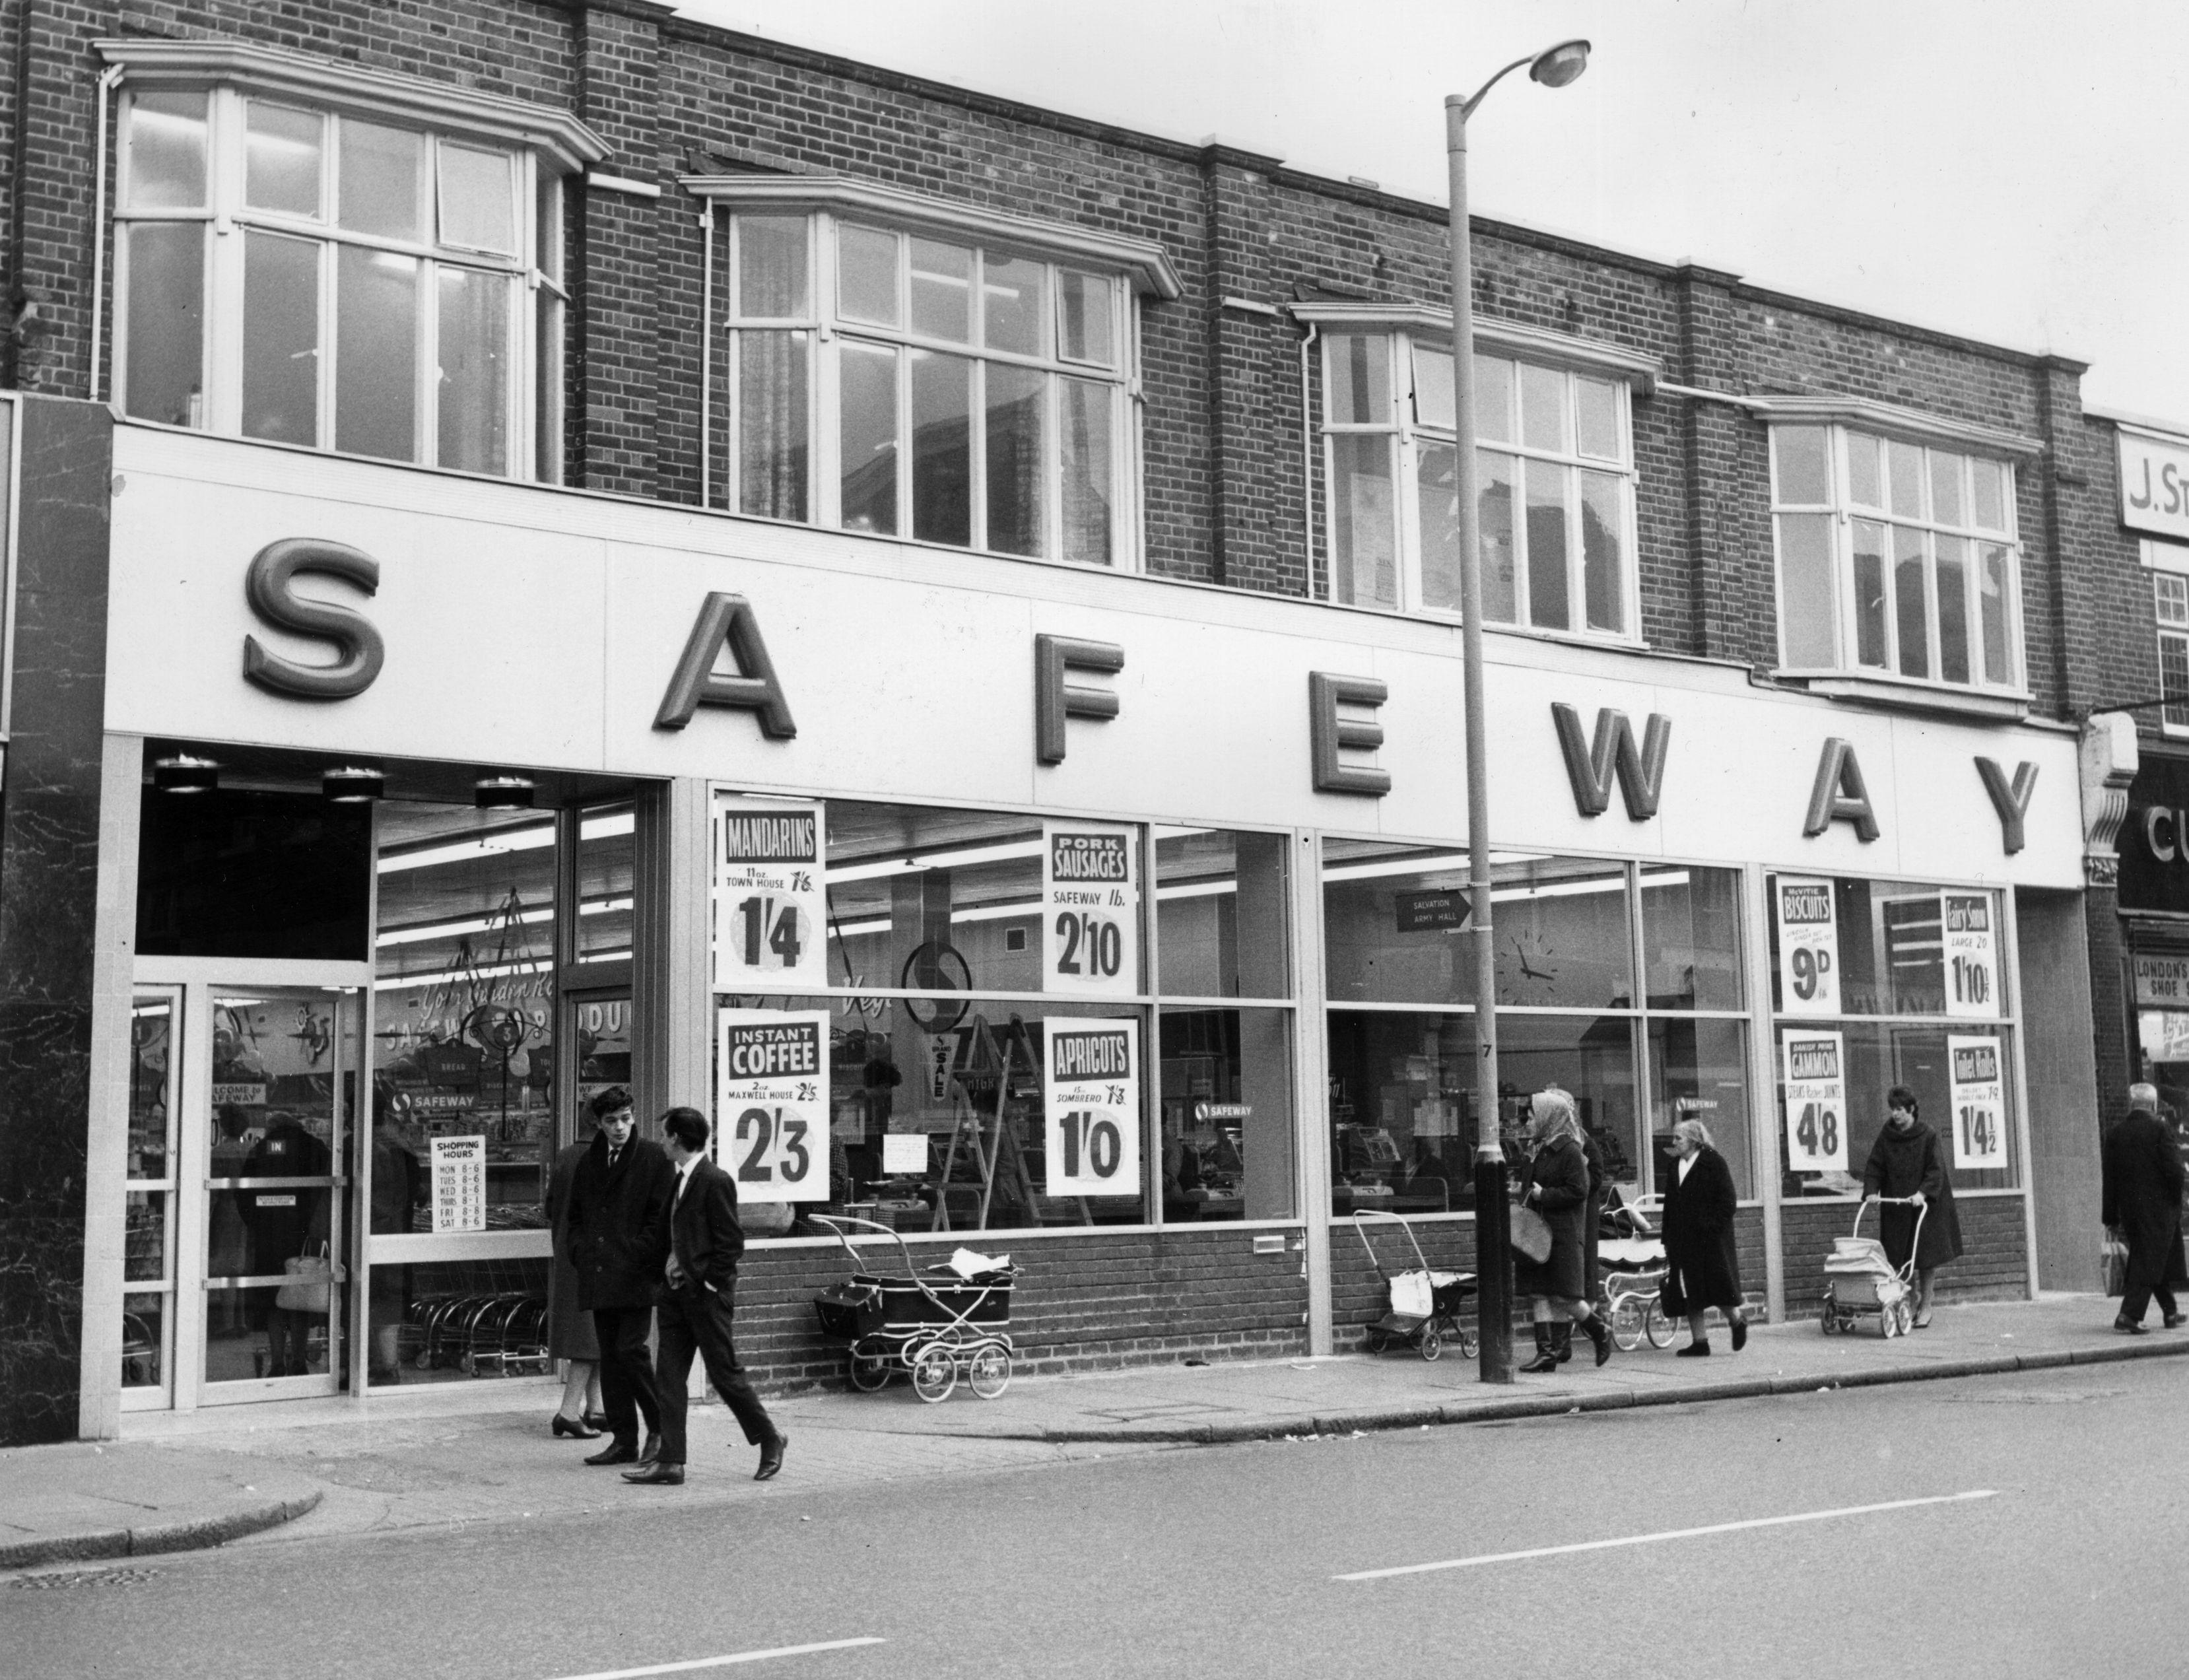 Safeway Circa 1960 in East Ham